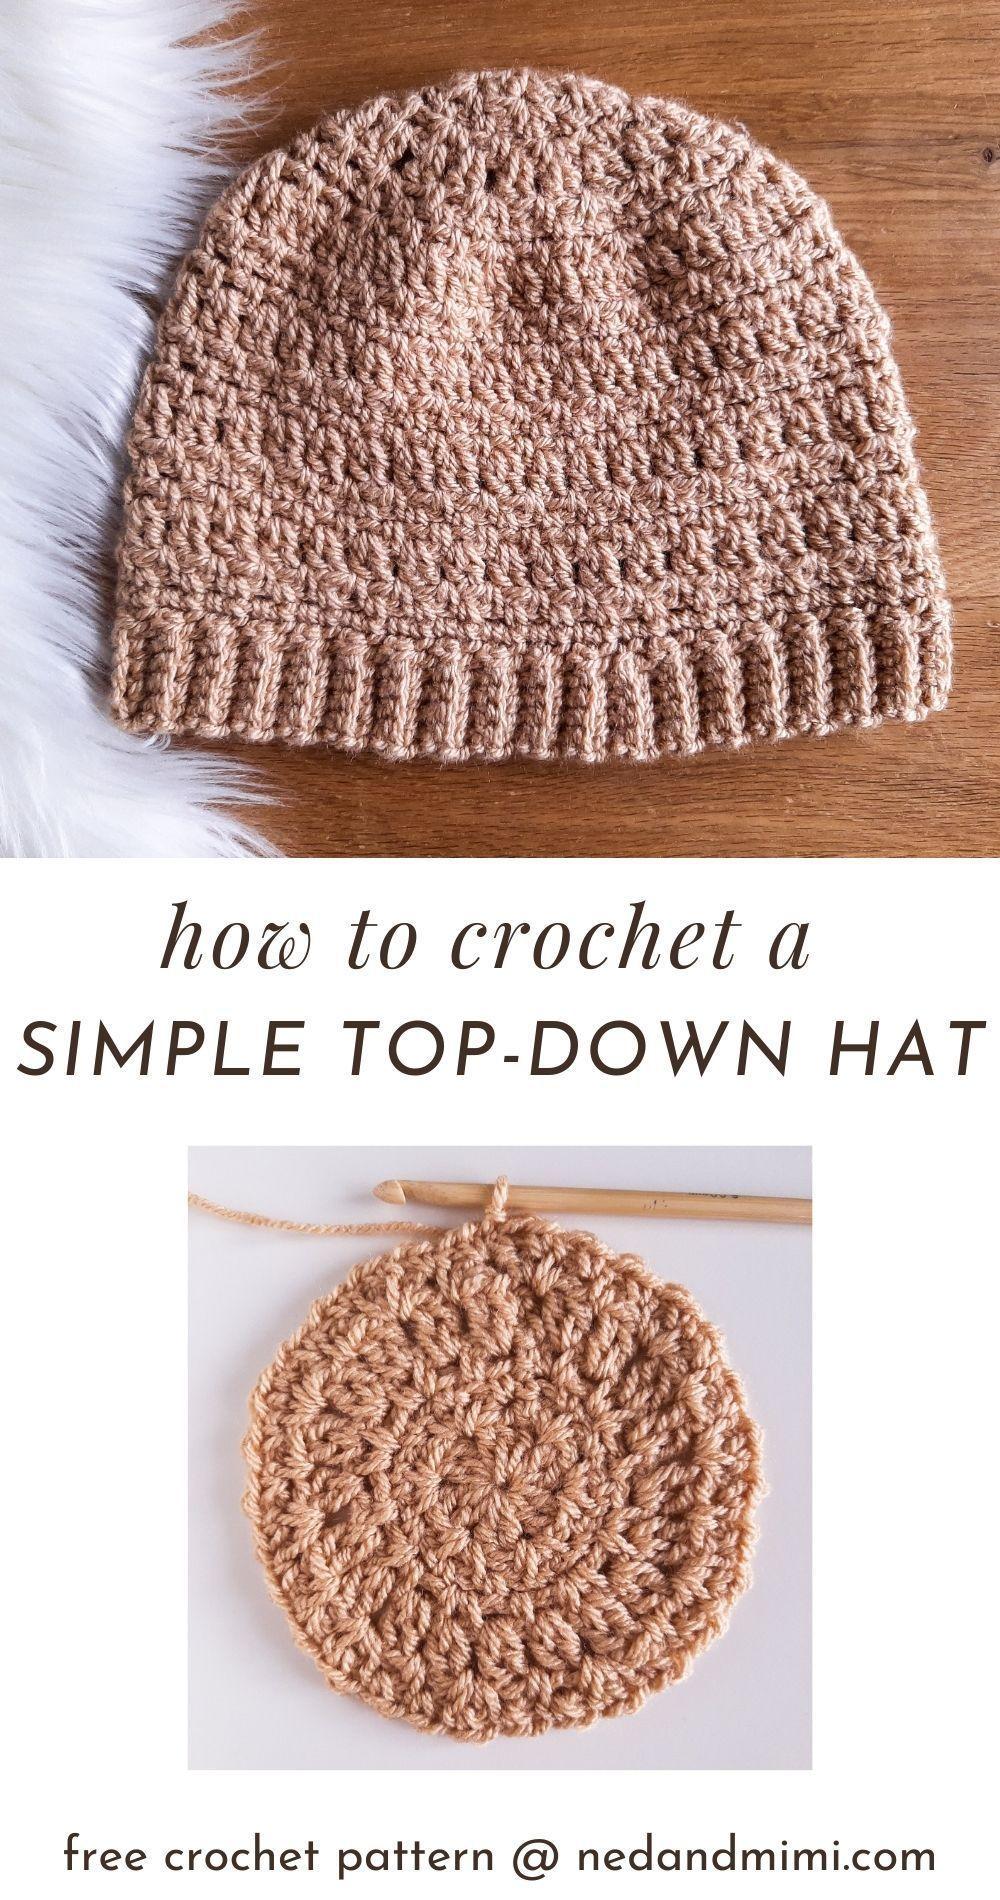 Jasmine Beanie Free Crochet Pattern Easy Crochet Hat Crochet Hats Free Pattern Crochet Hat For Beginners